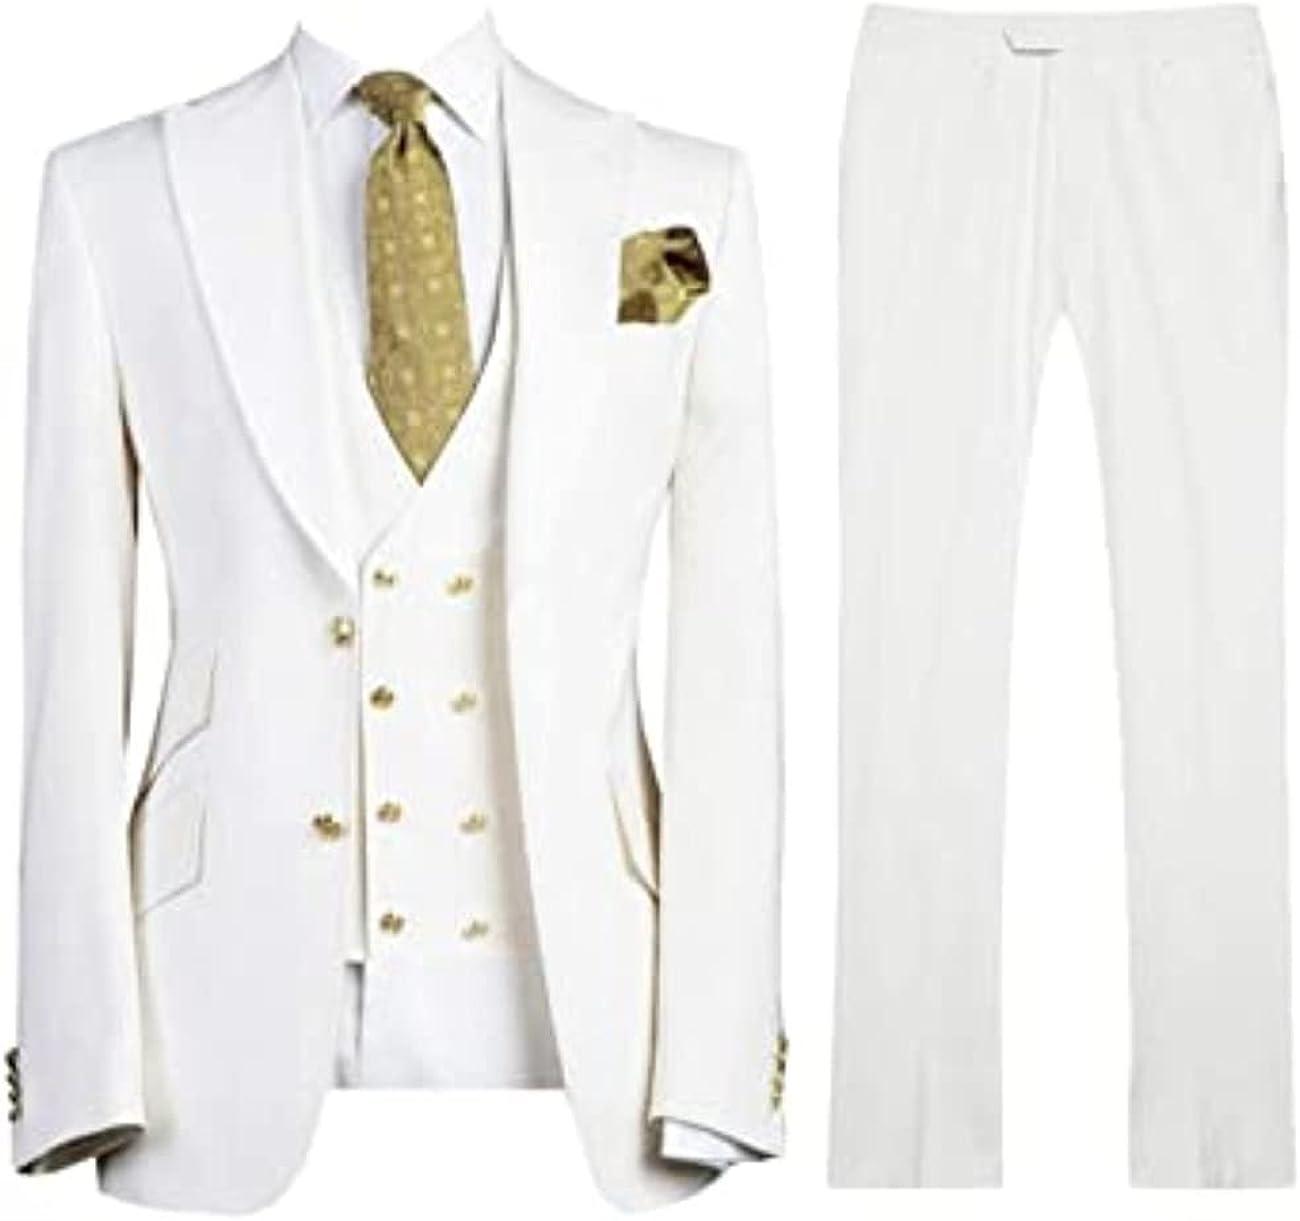 Men's Fashion 3 Pieces Set Slim Fit Jacket Suits for Men Groom Wedding Tuxedos